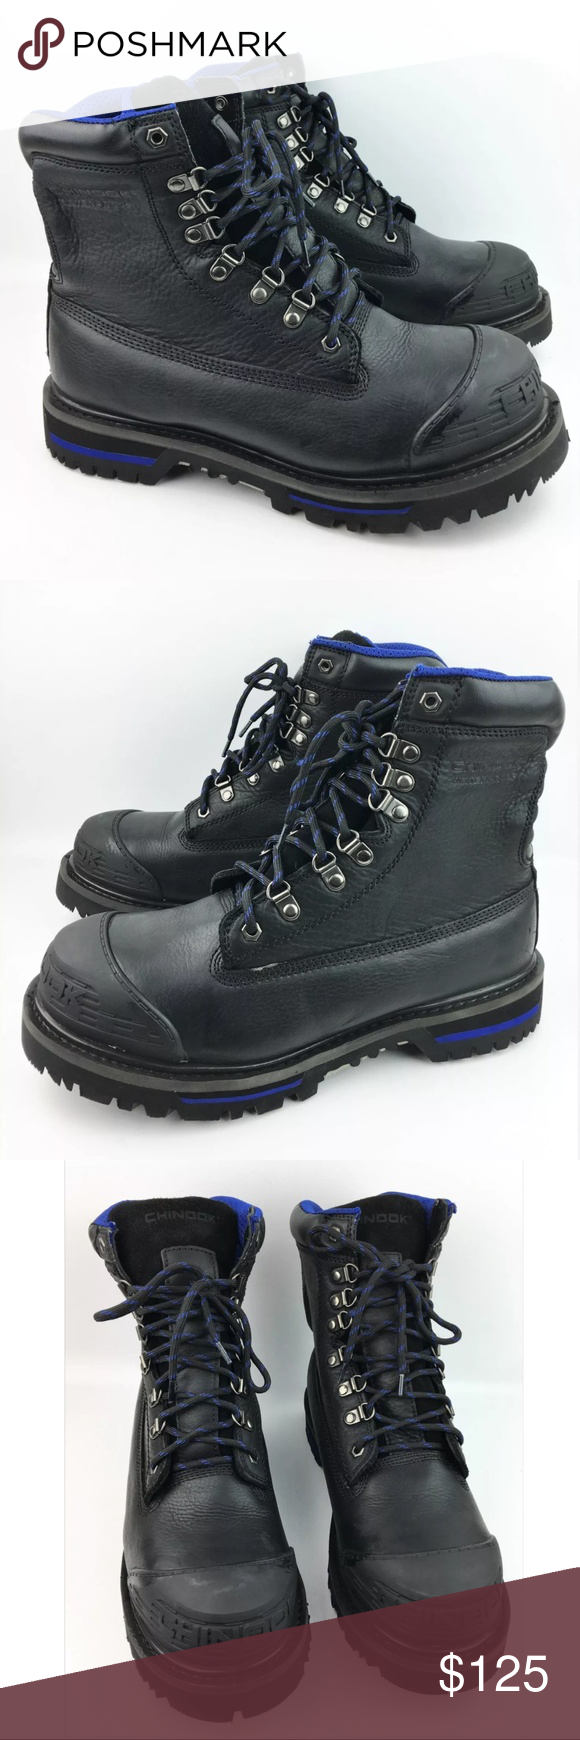 4ffc8caa4e5 Chinook Tarantula Waterproof Steel Toe Work Boots Boots have minor ...